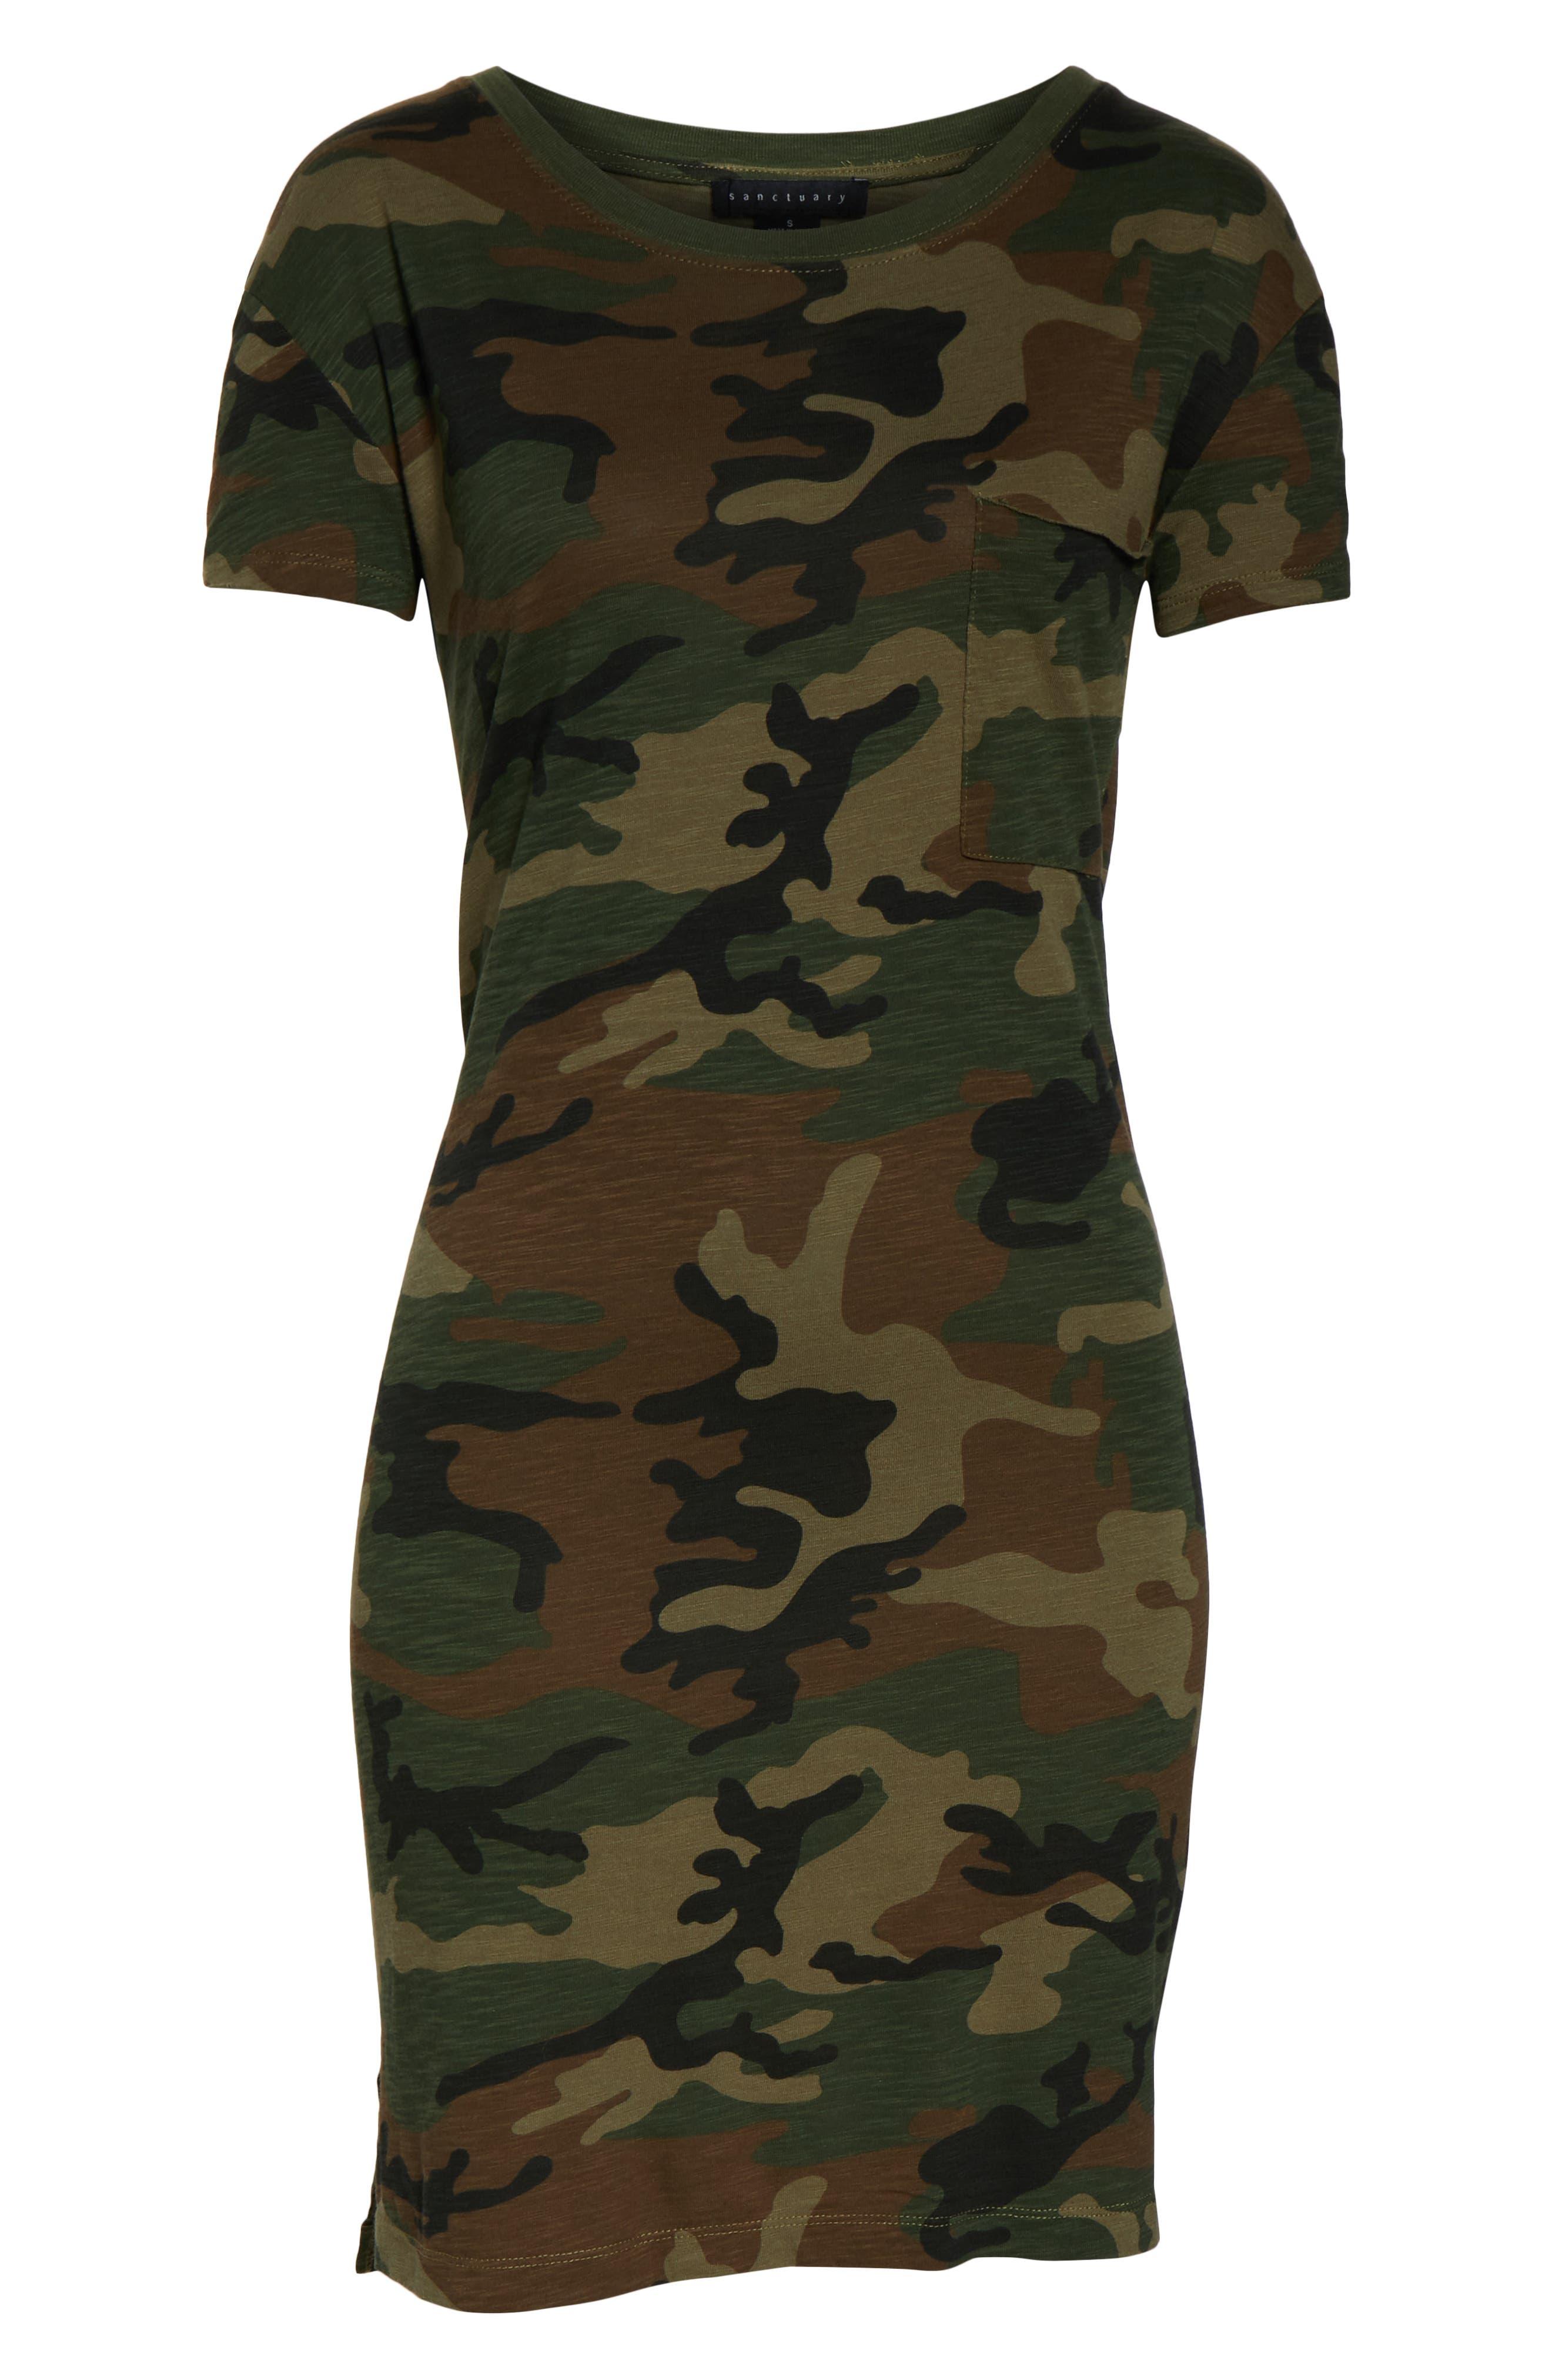 SANCTUARY, Camo Print T-Shirt Dress, Alternate thumbnail 5, color, LOVE CAMO